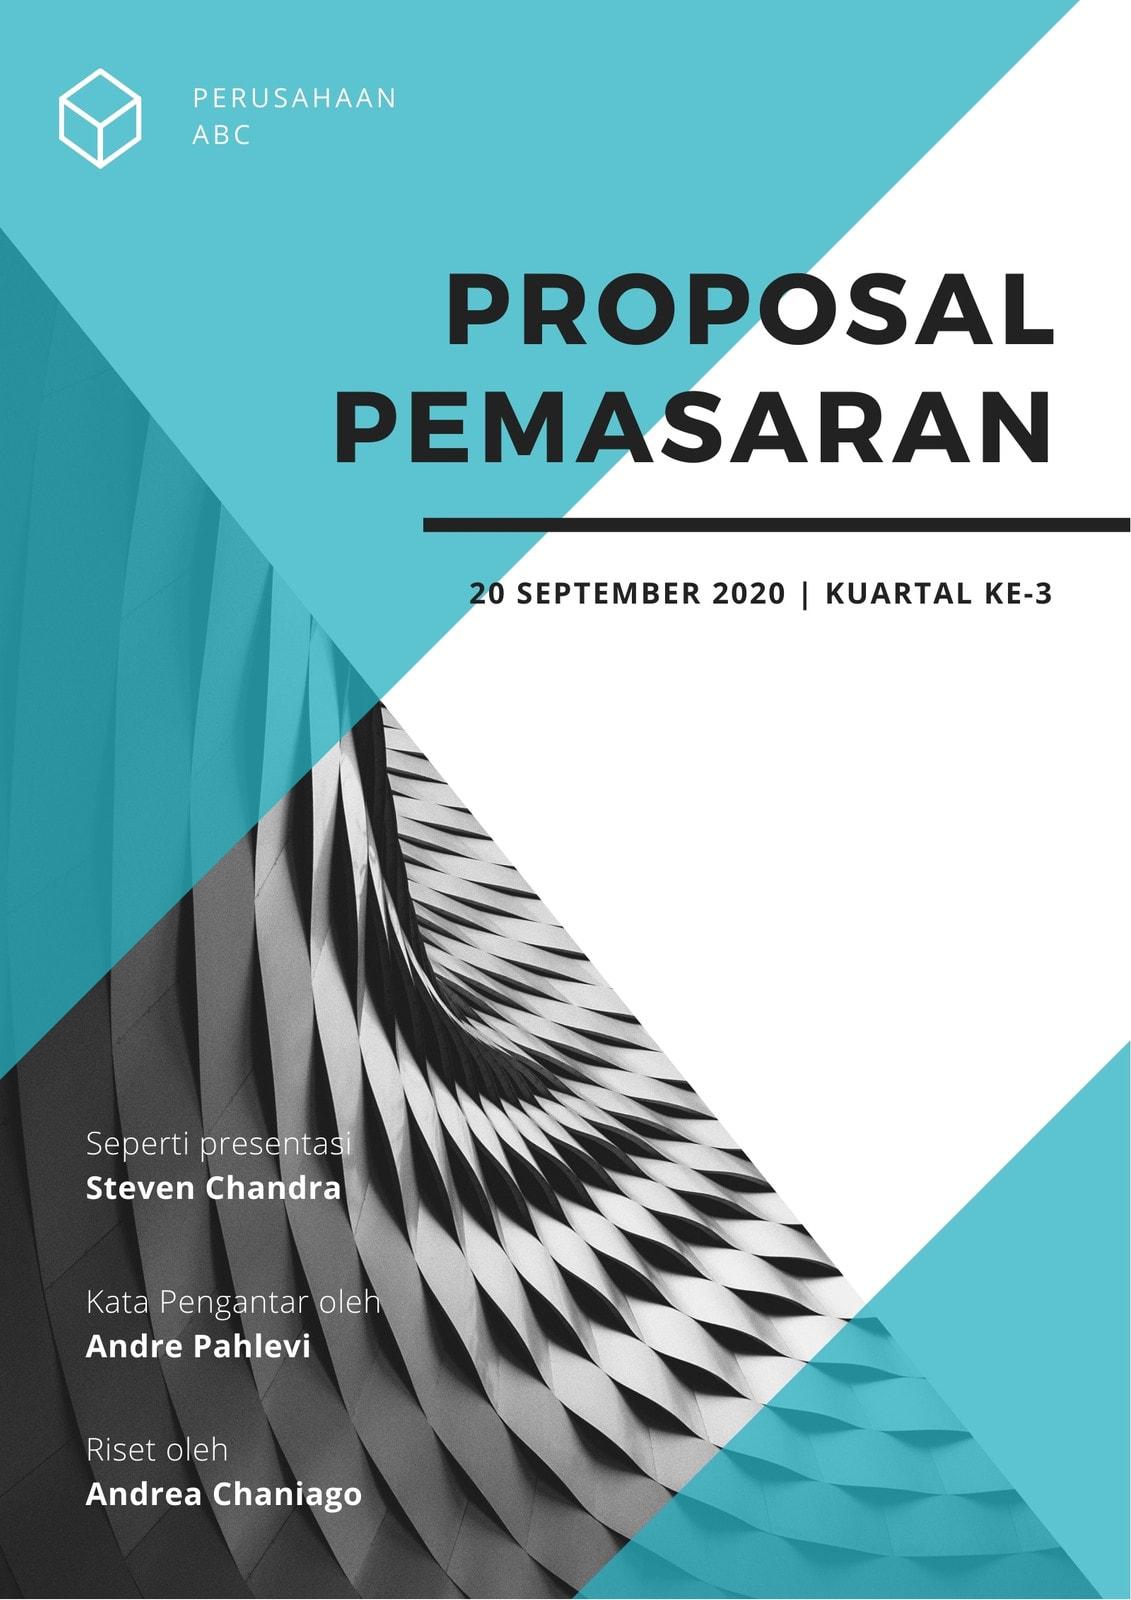 Proposal Pemasaran Bentuk Segitiga Biru dan Putih